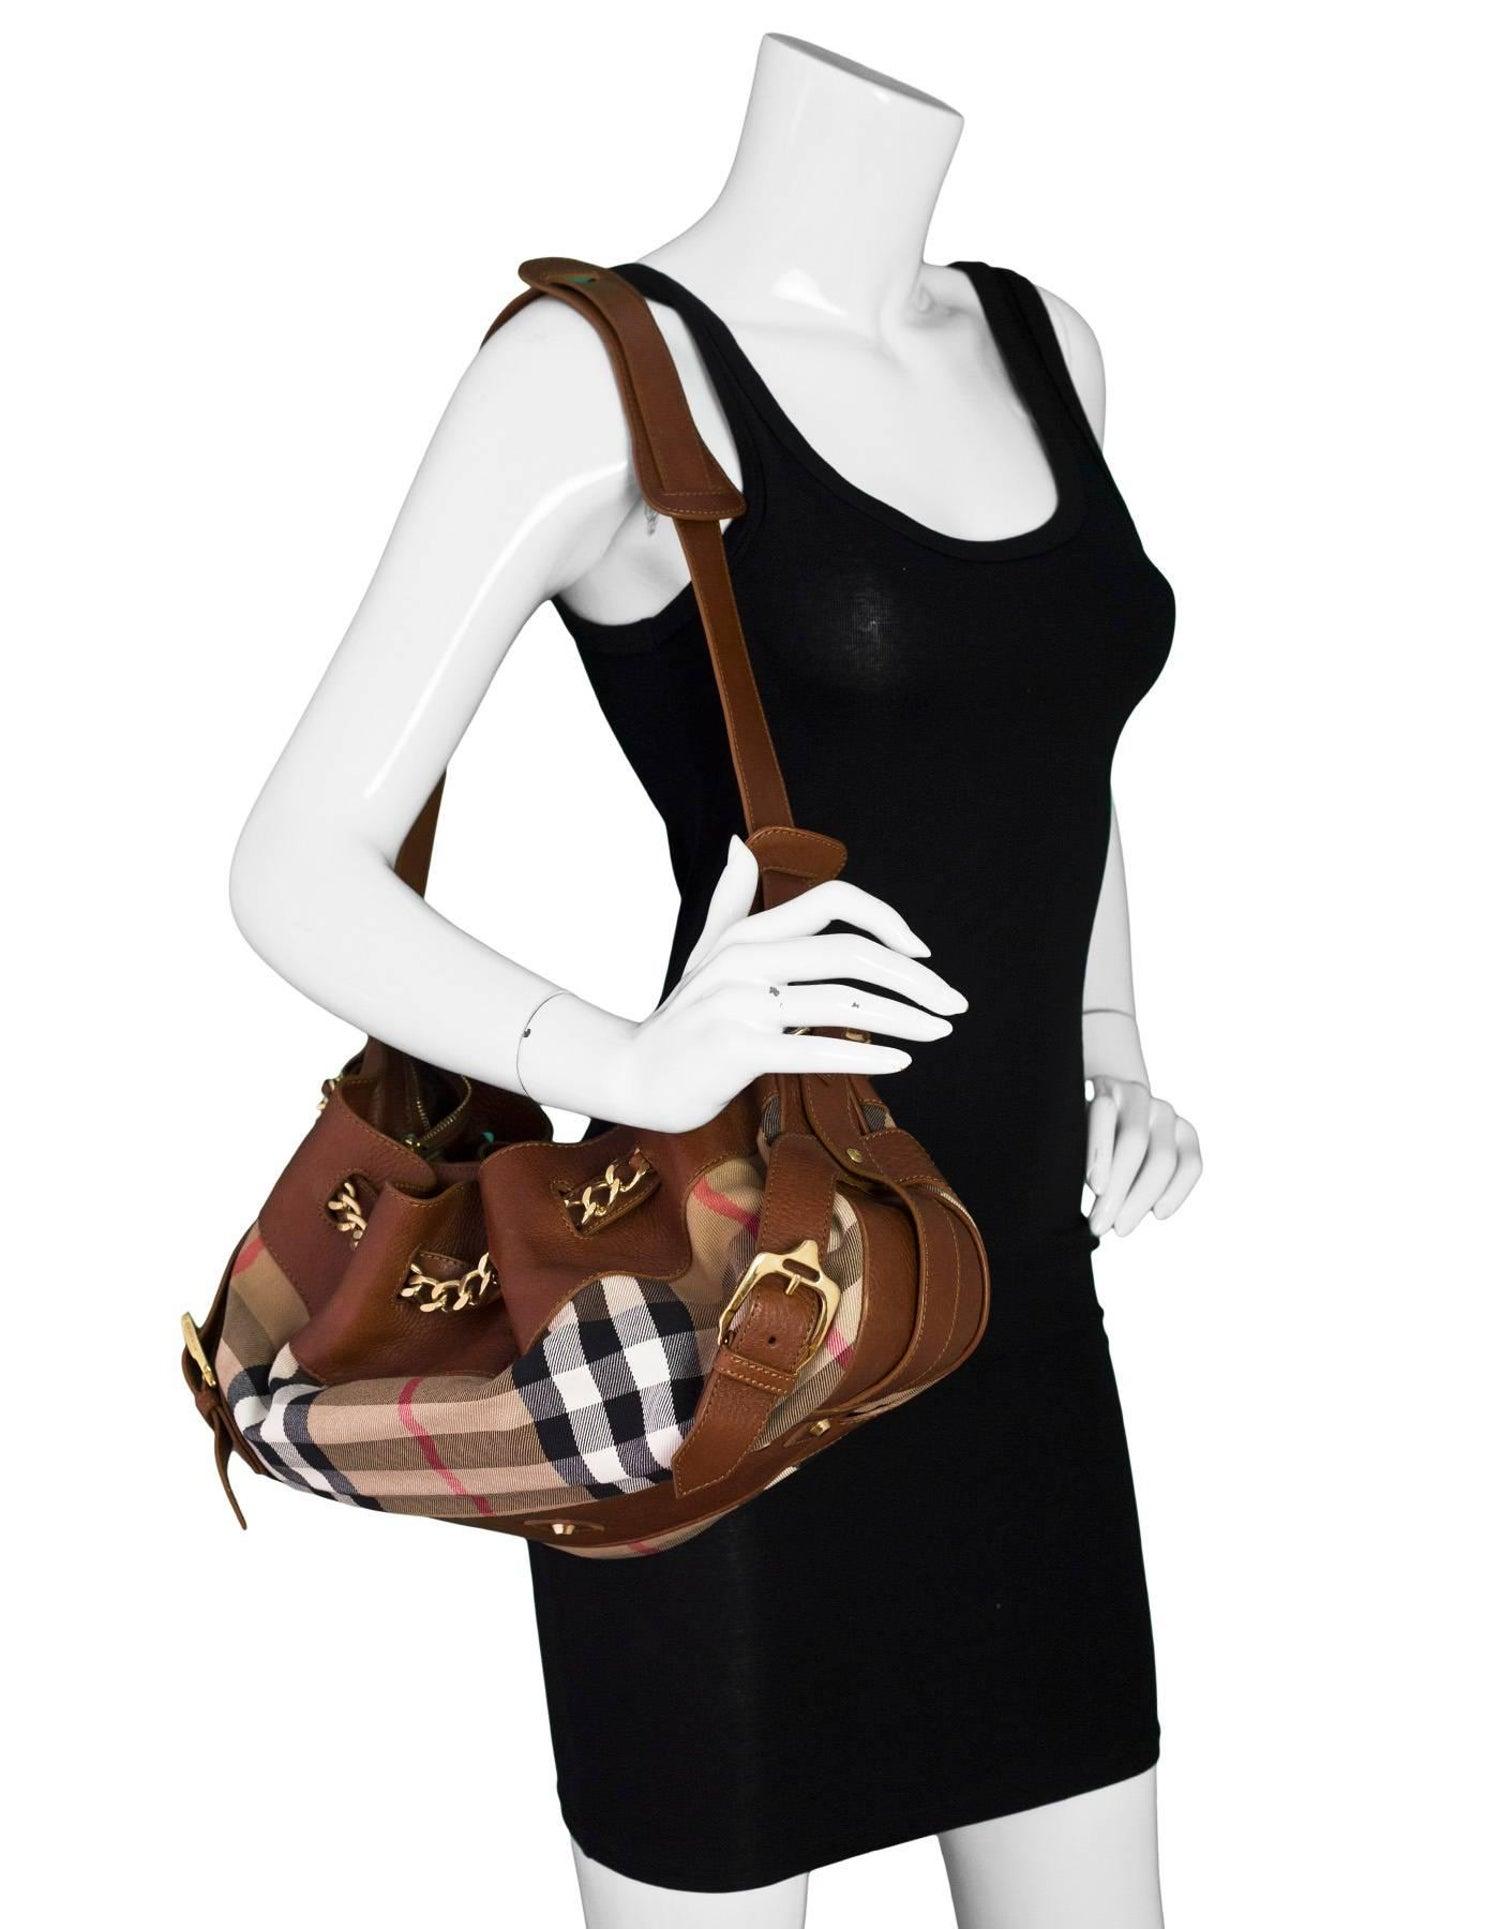 6658668e153e Burberry Margaret Nova Check Canvas and Tan Leather Bag For Sale at 1stdibs